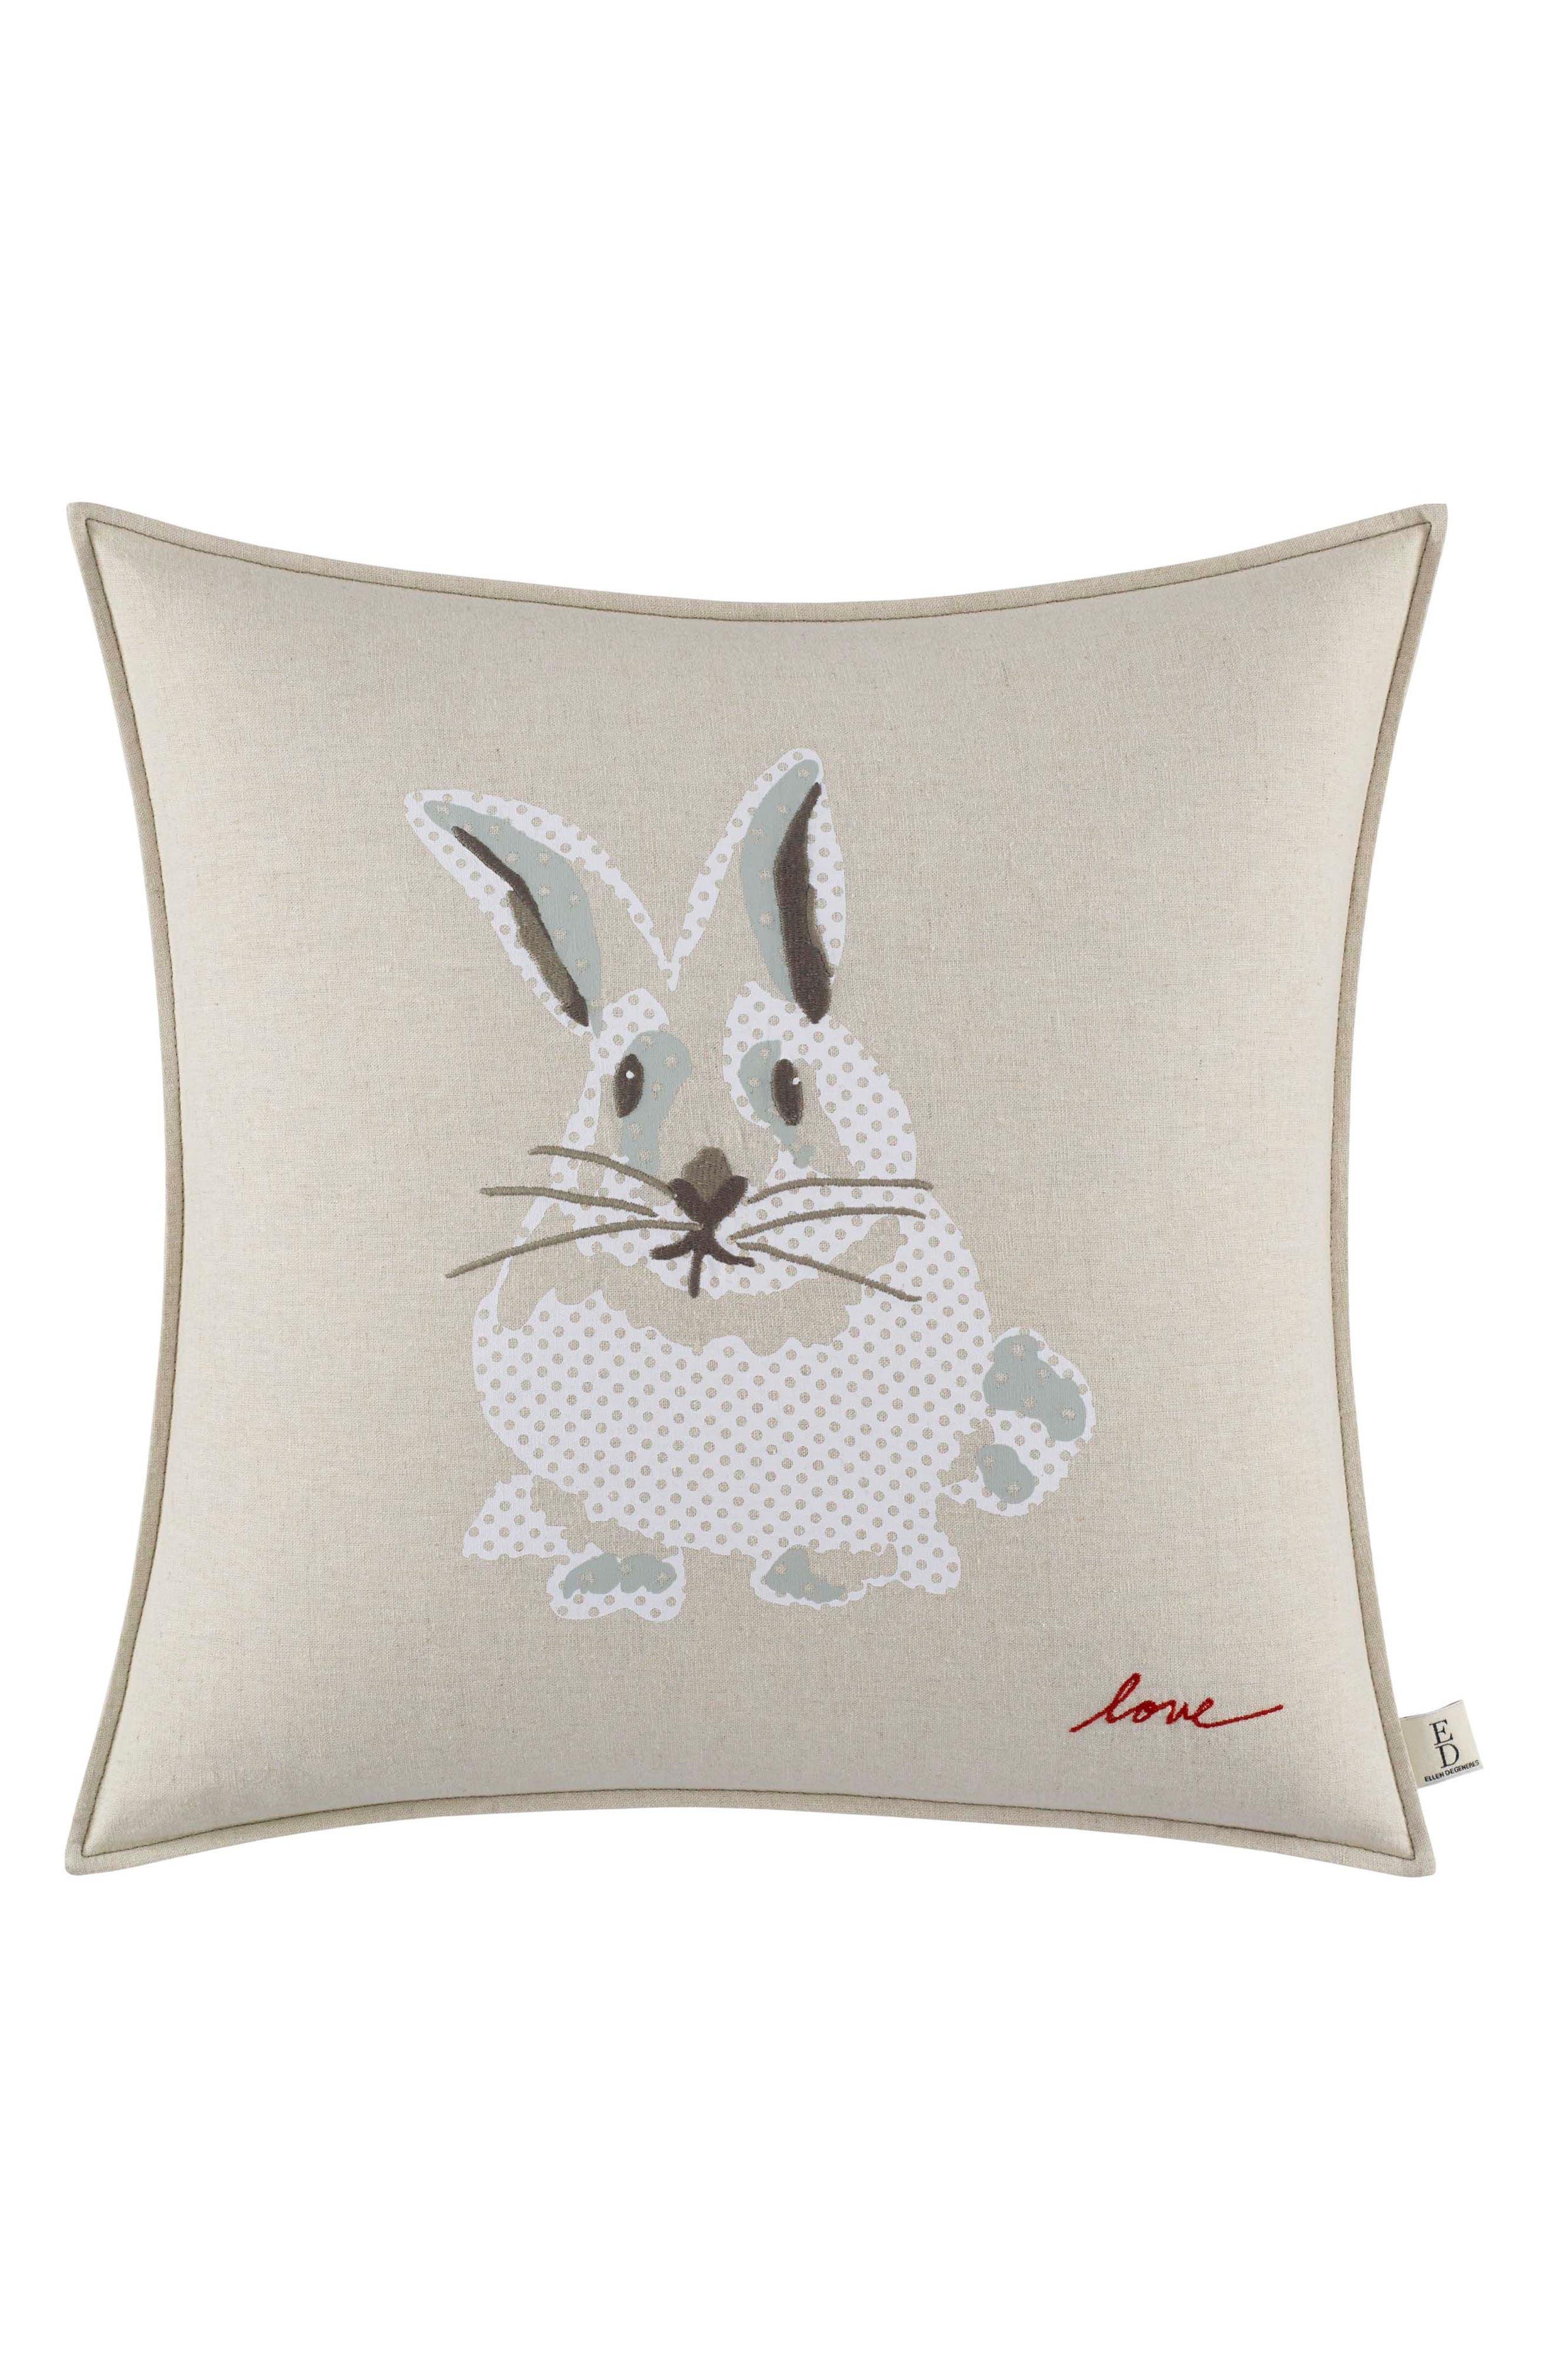 Bunny Pillow,                         Main,                         color, BEIGE